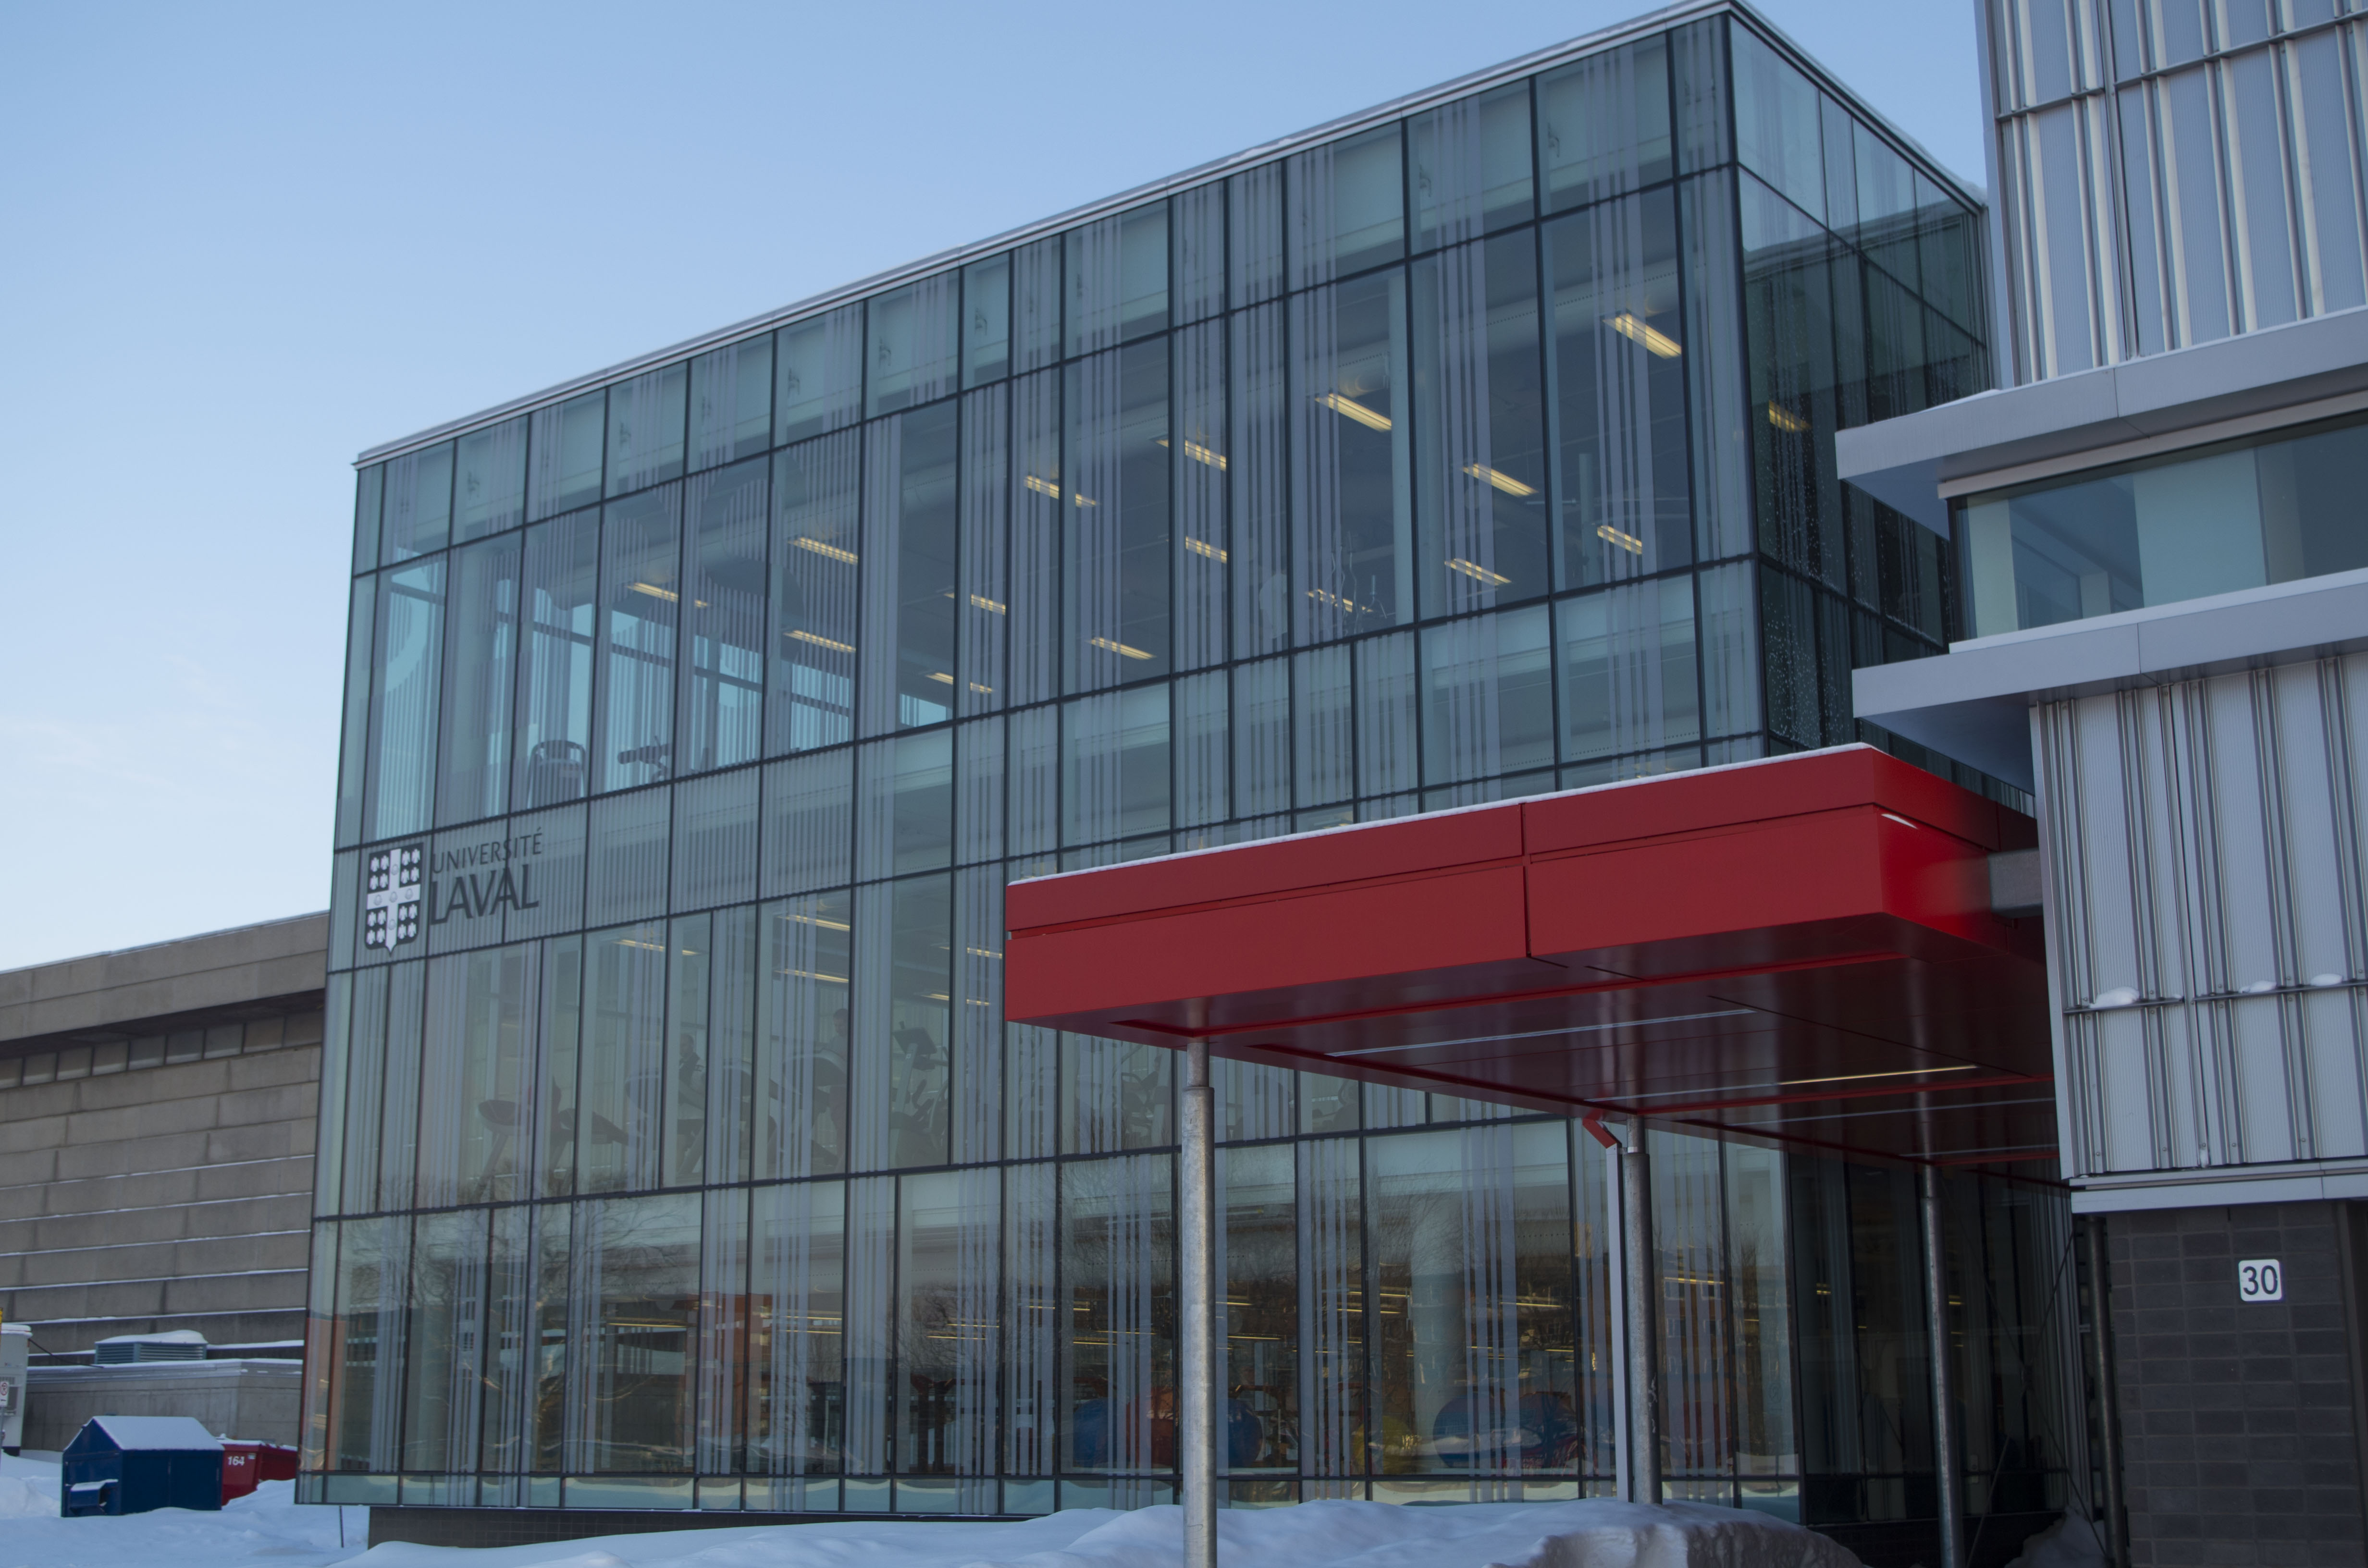 University of Laval